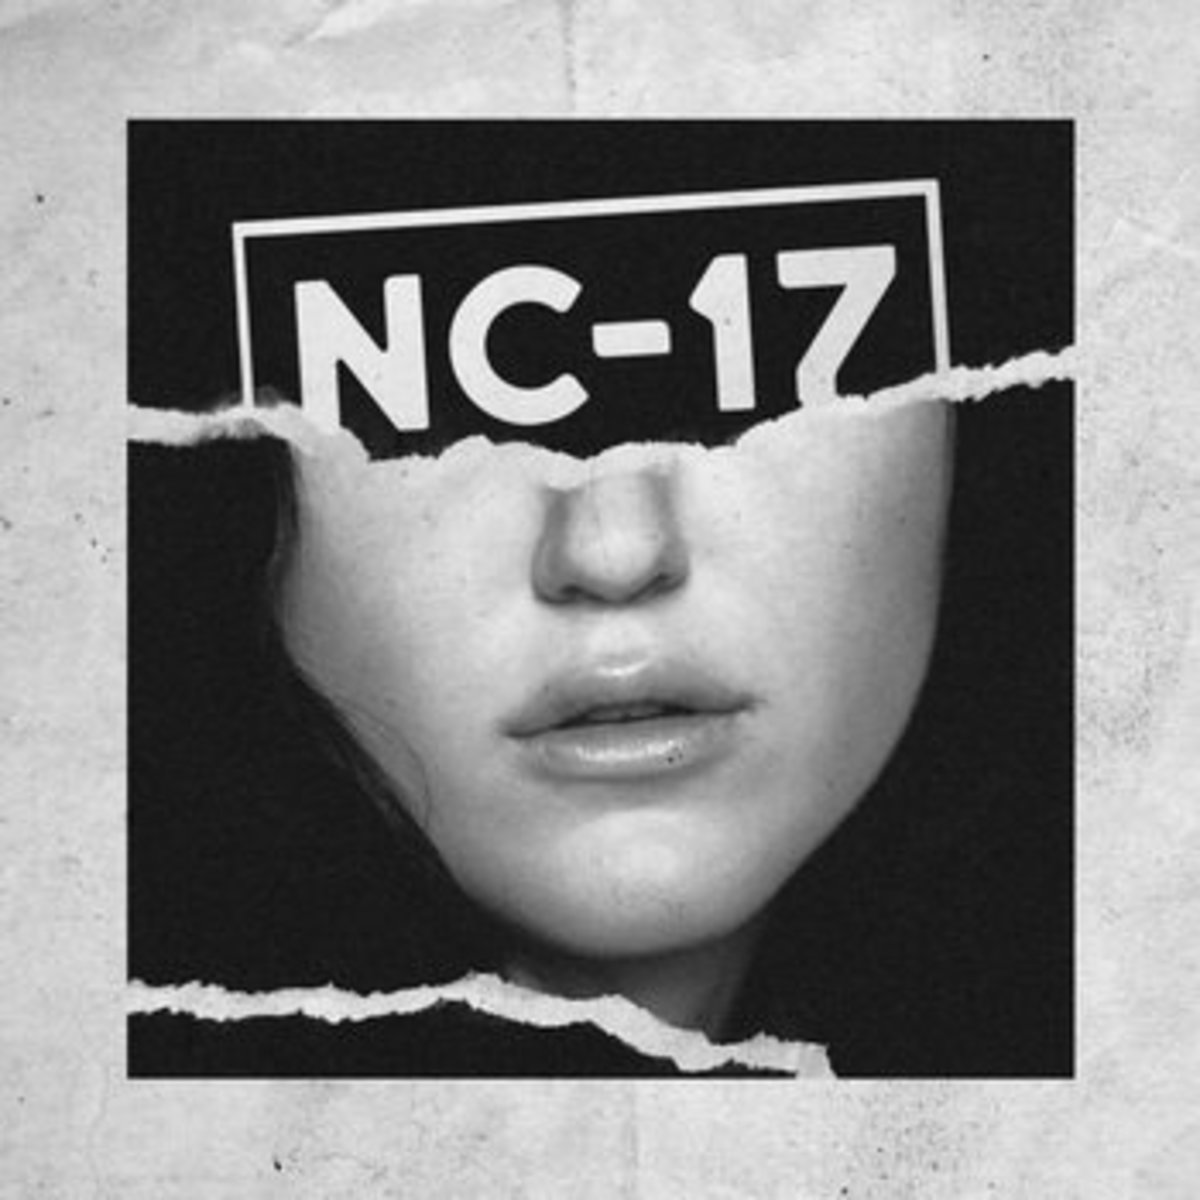 Noah Cyrus Album